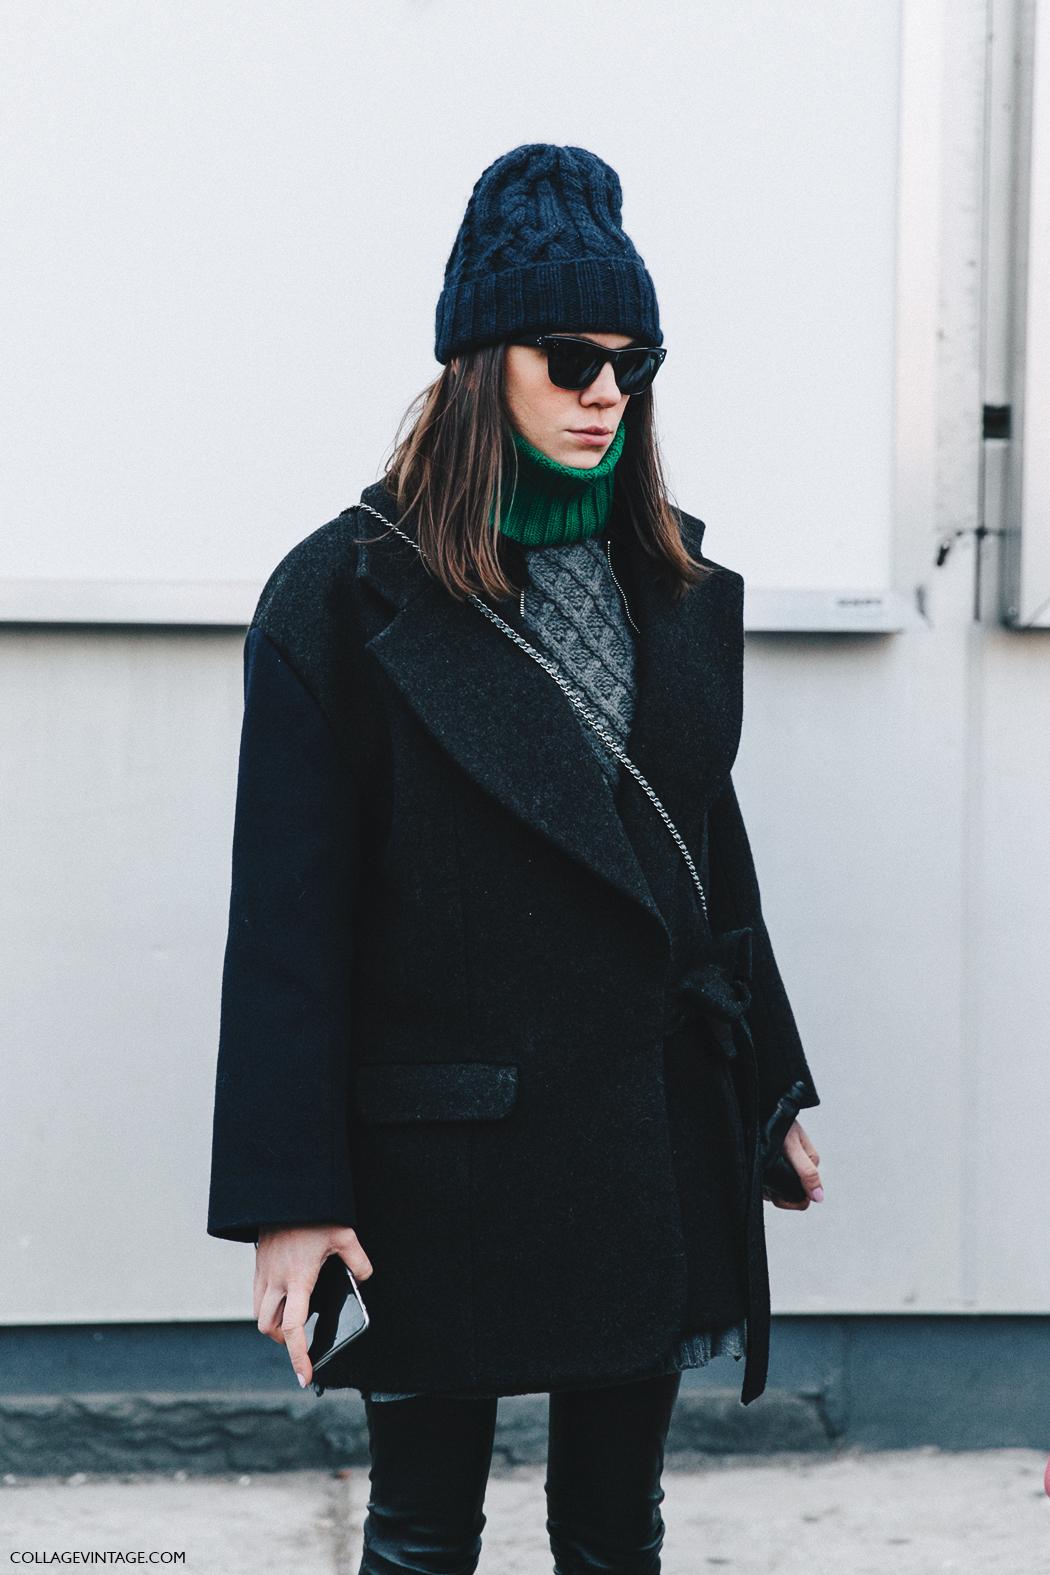 NYFW-New_York_Fashion_Week-Fall_Winter-17-Street_Style-Julia_Gall-Beanie-